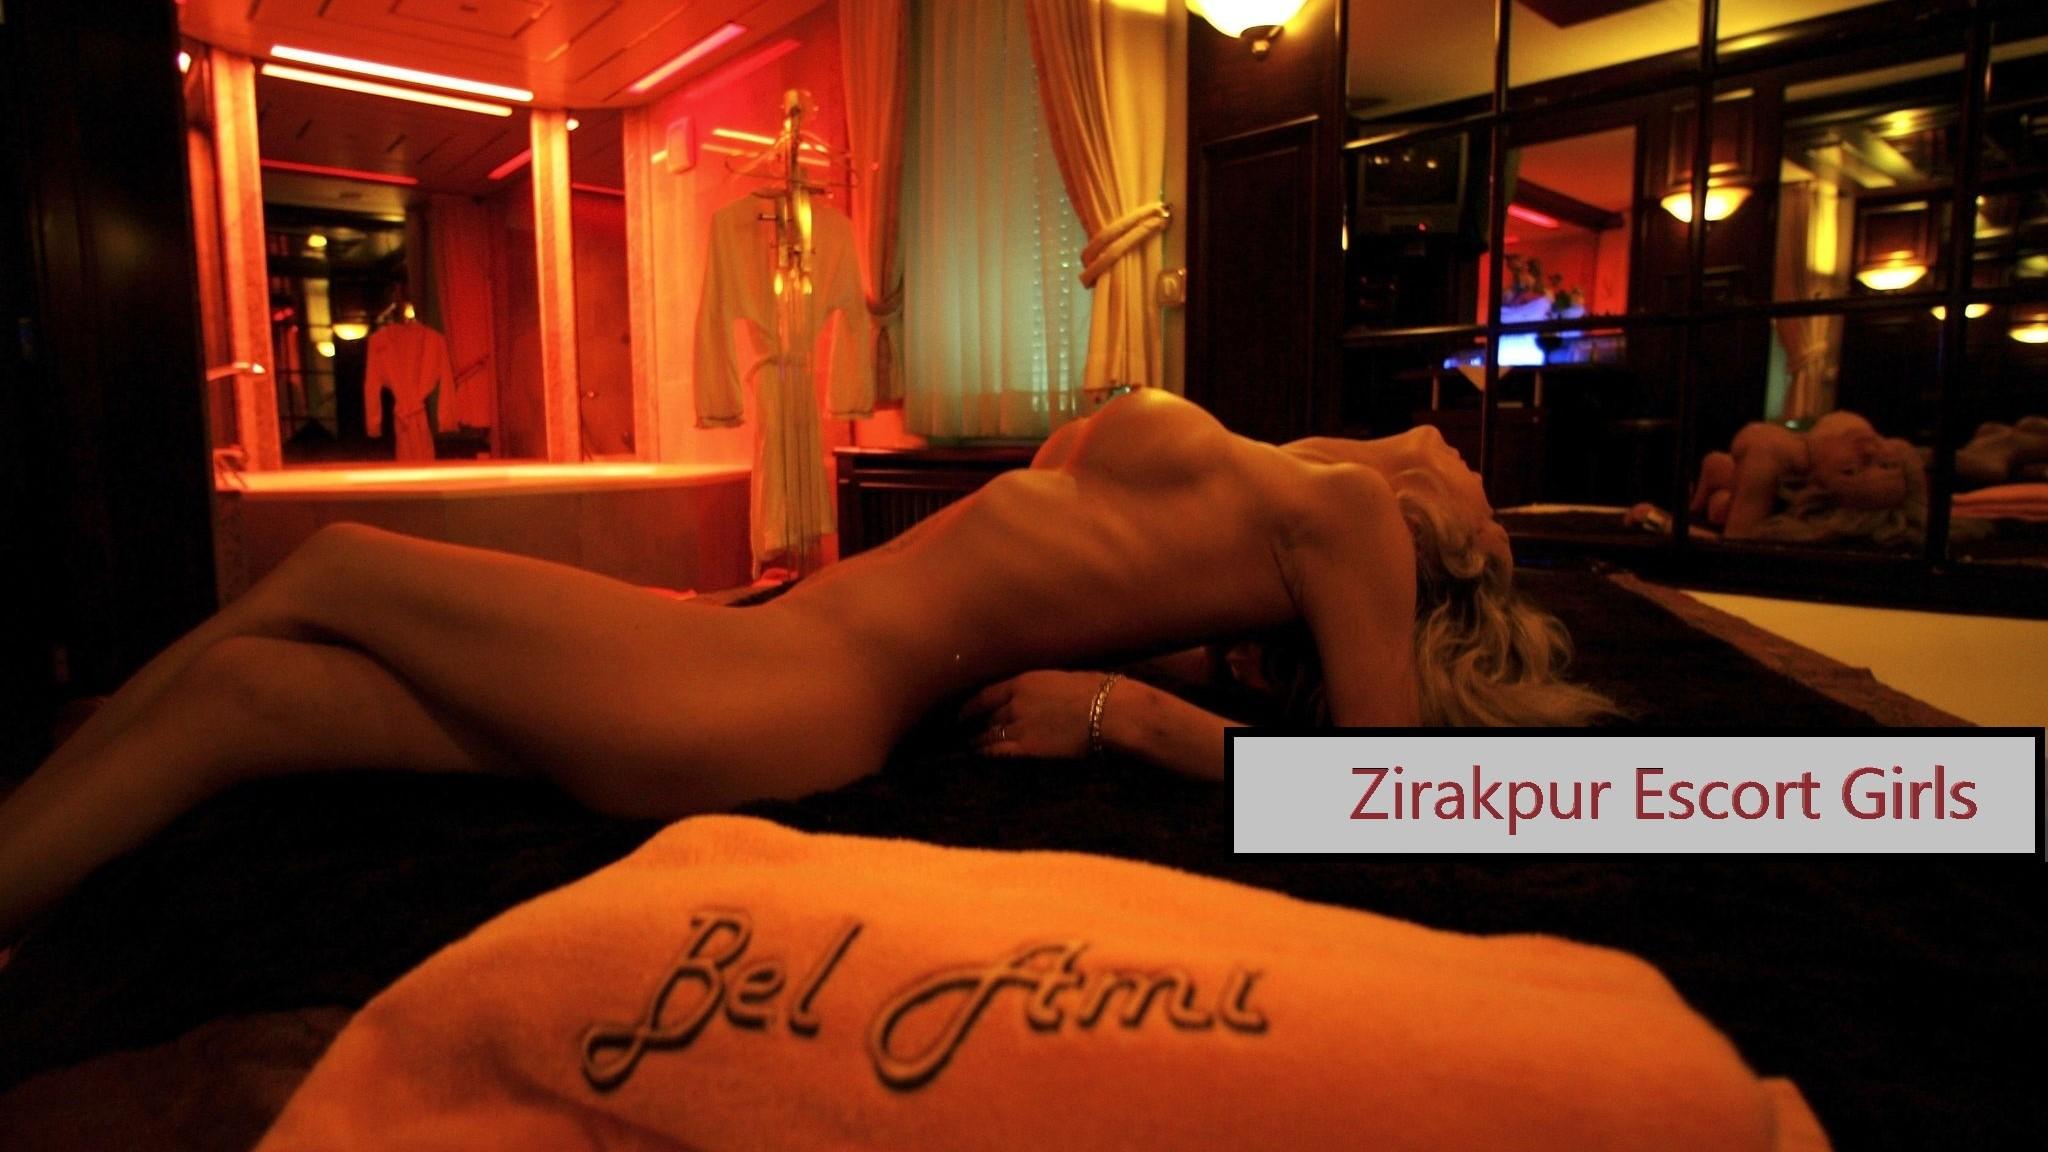 Zirakpur escort girls services - banner